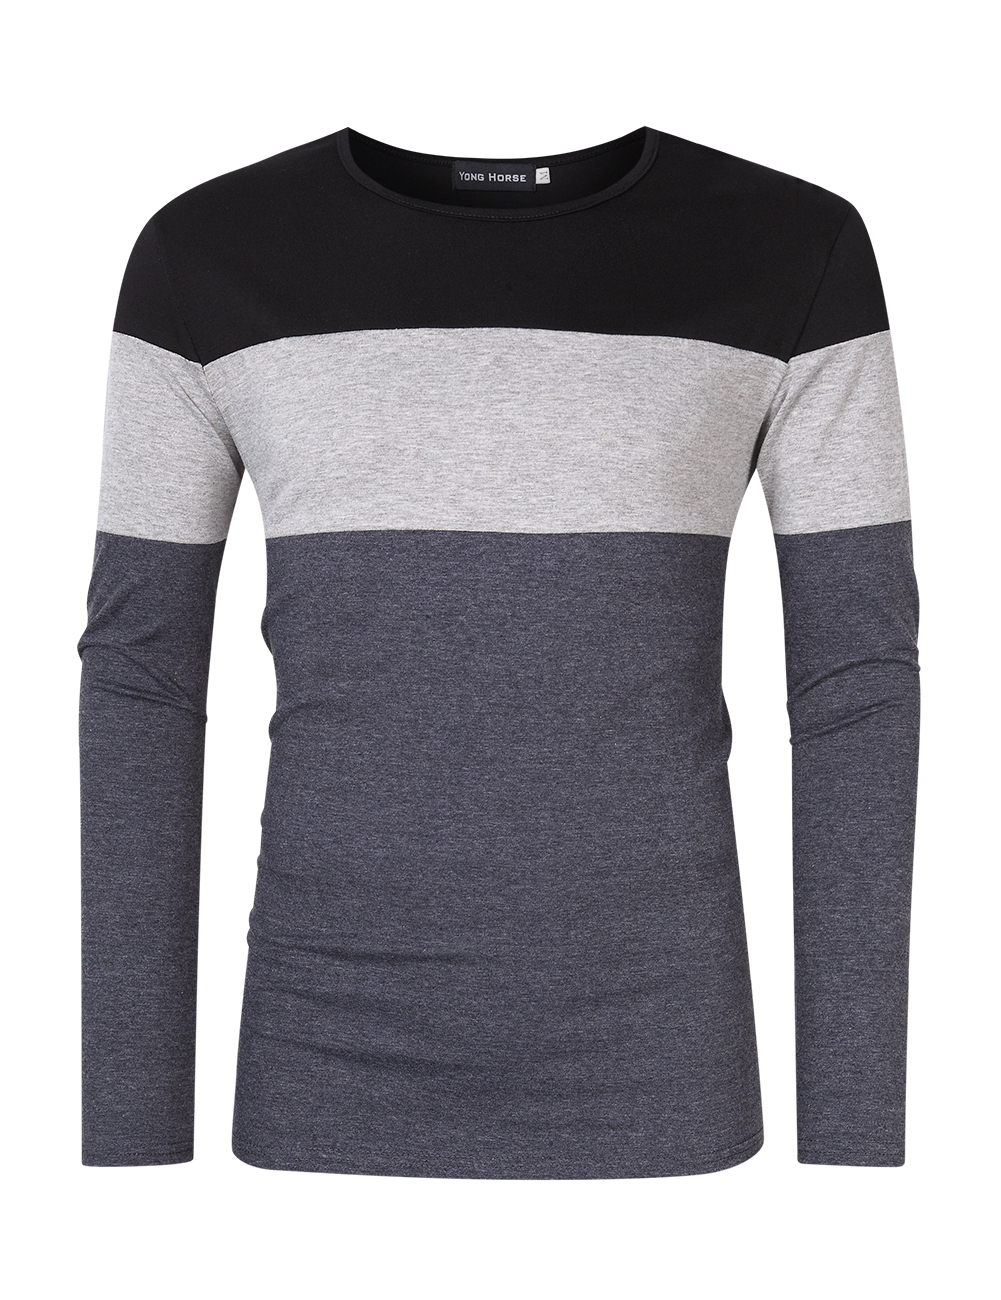 [US Direct] Yong Horse Men's Color Block Slim Fit Crew Neck Long Sleeve Basic Cotton T-Shirt Black + light gray_M